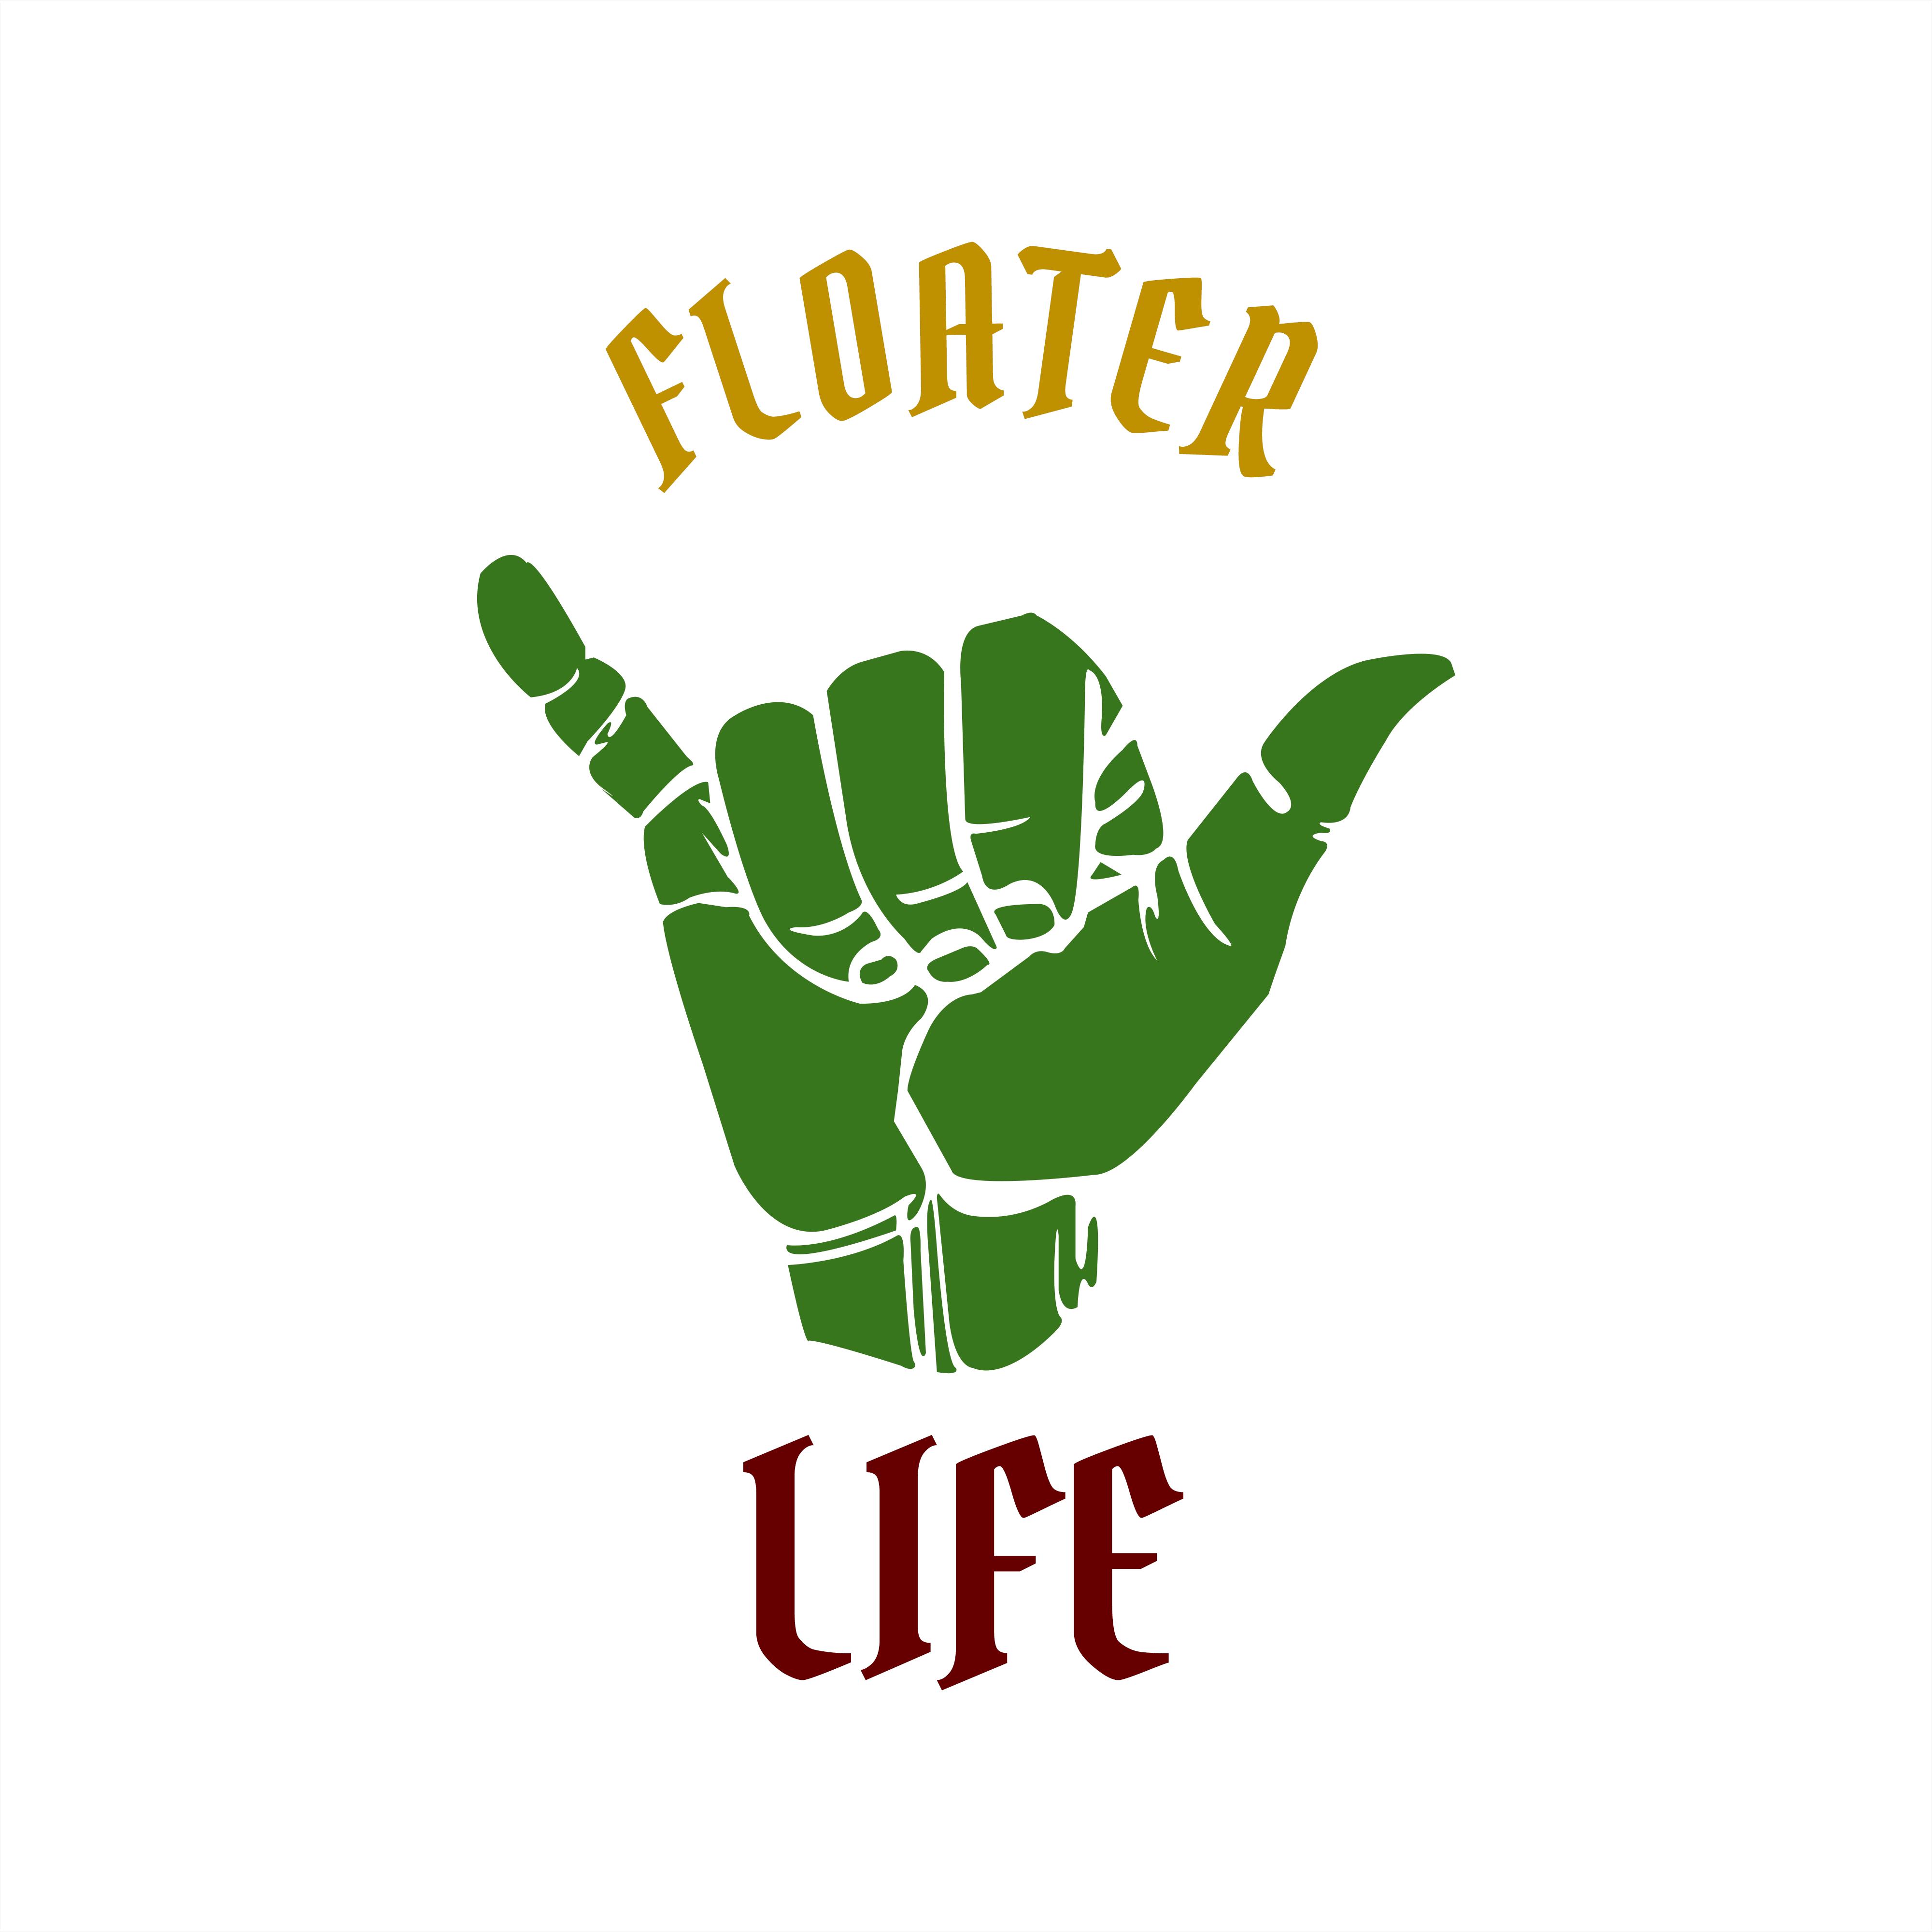 4000x4000 Rasta Floater Life Tee